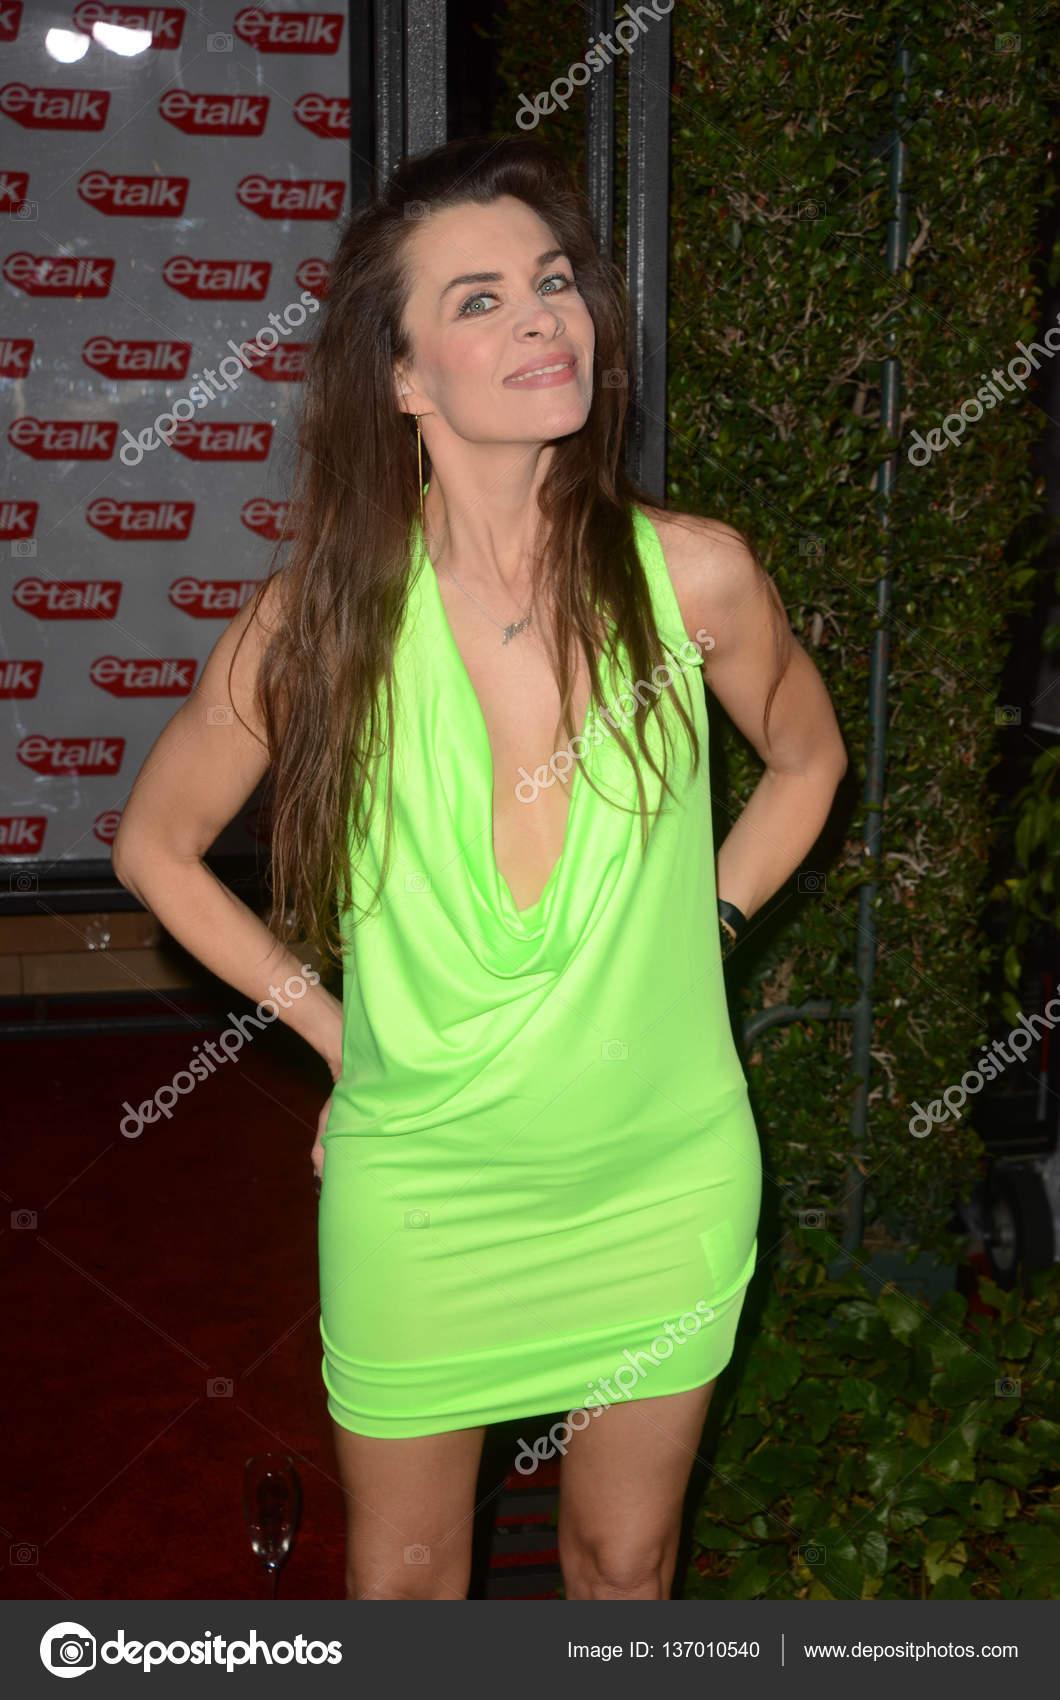 Cleavage Lara Stone nude (33 photo), Ass, Hot, Boobs, lingerie 2020